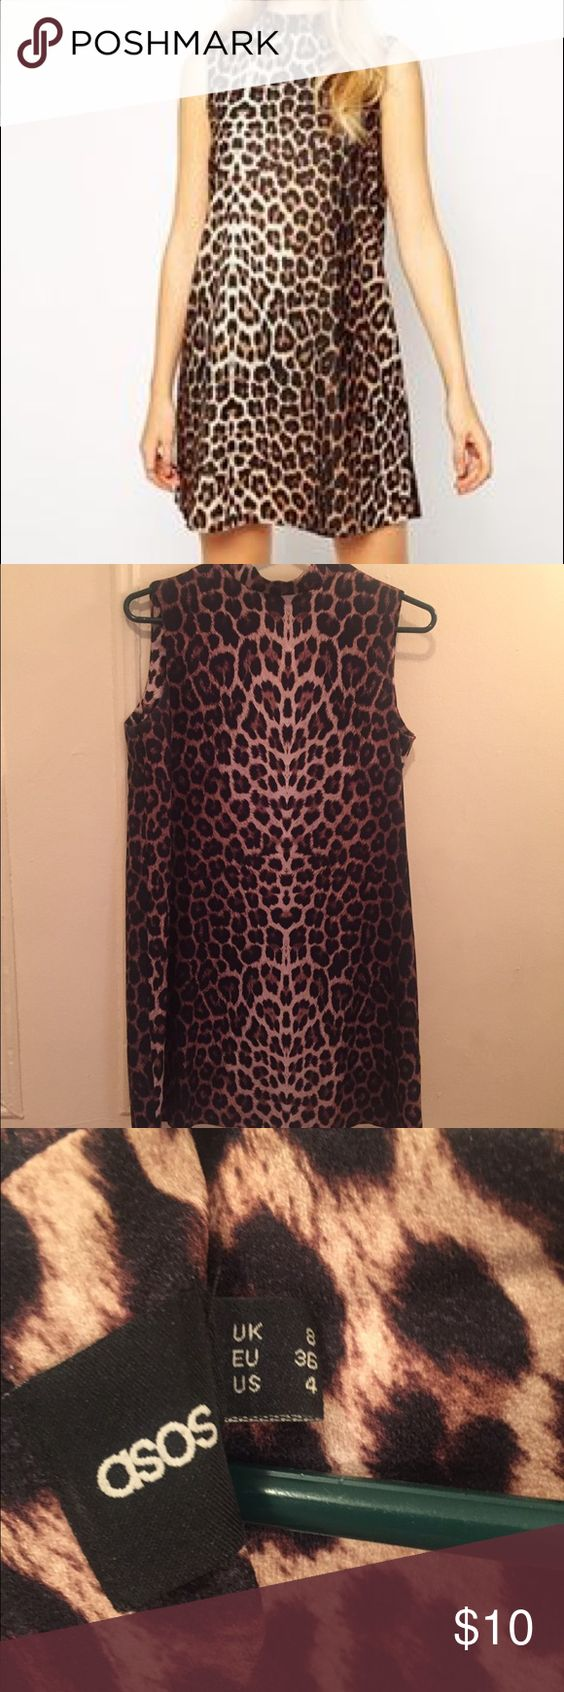 ASOS leopard print shift dress US size 4 / UK size 8. Hardly worn. ASOS Dresses Midi